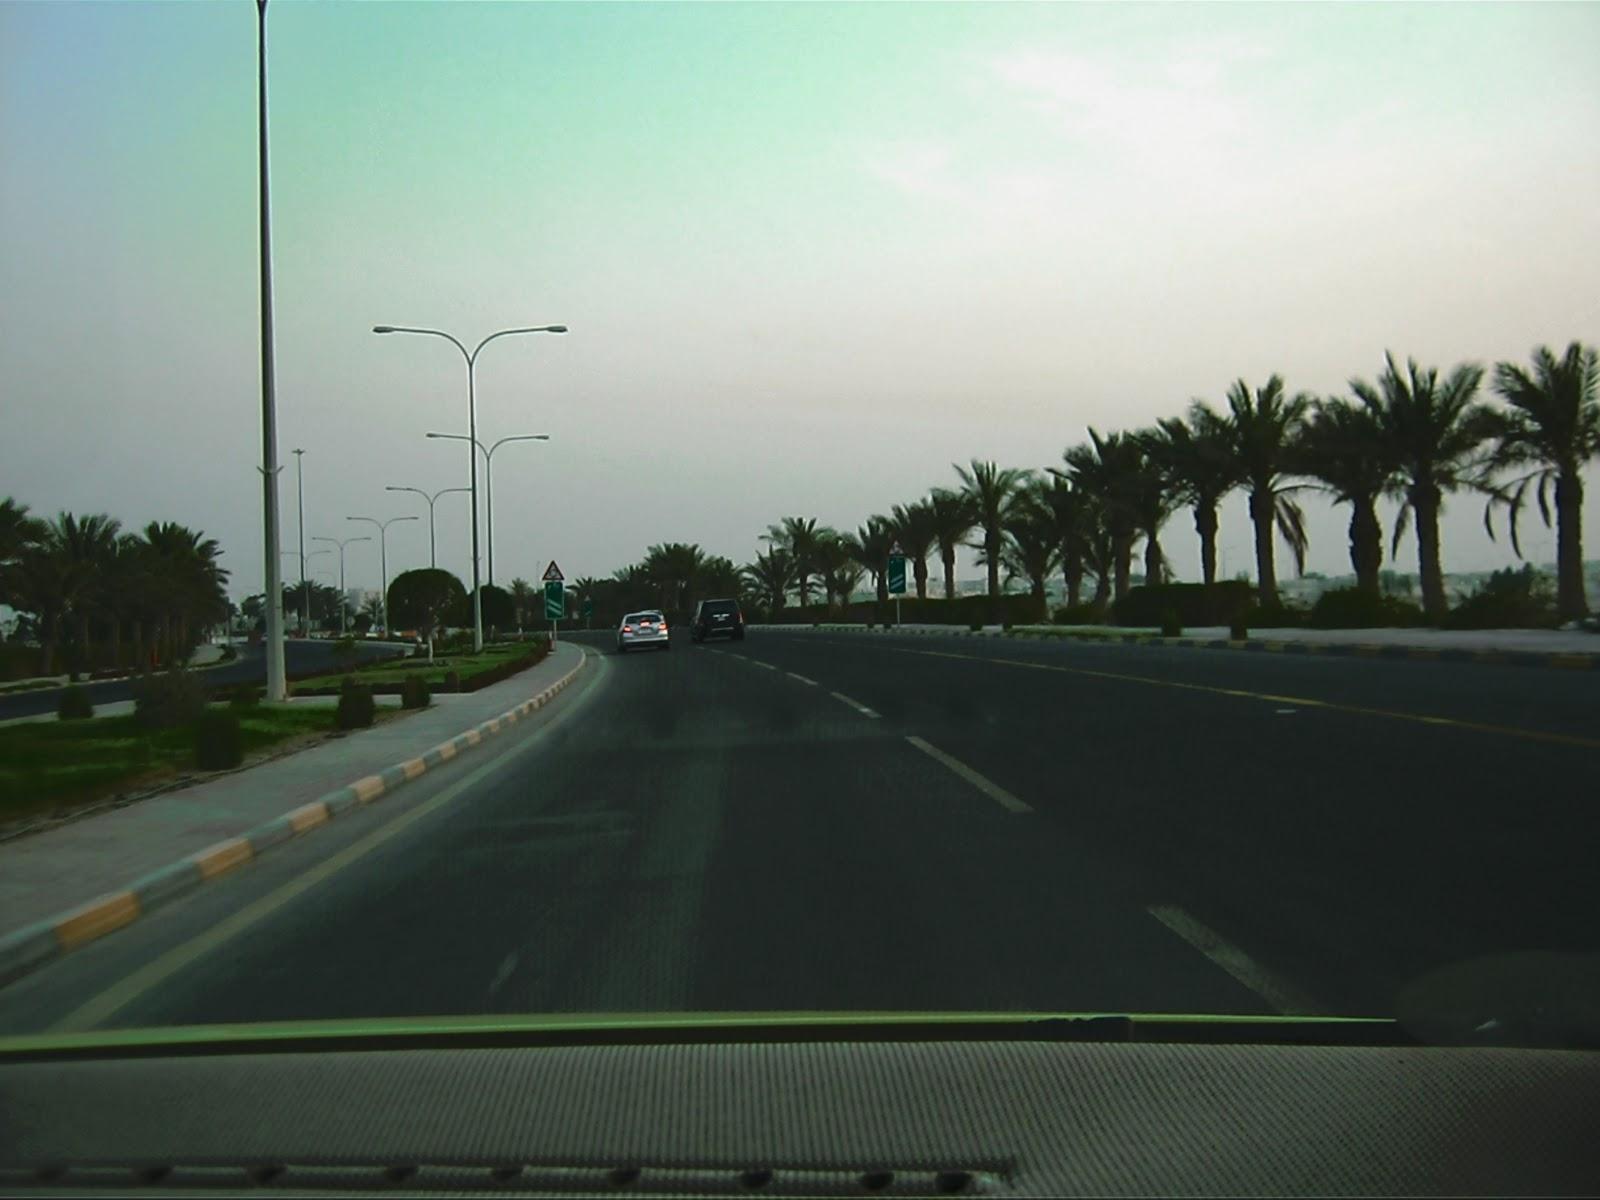 Mesaieed Qatar  city images : Arjunpuri in Qatar: Mesaieed Beach in Qatar